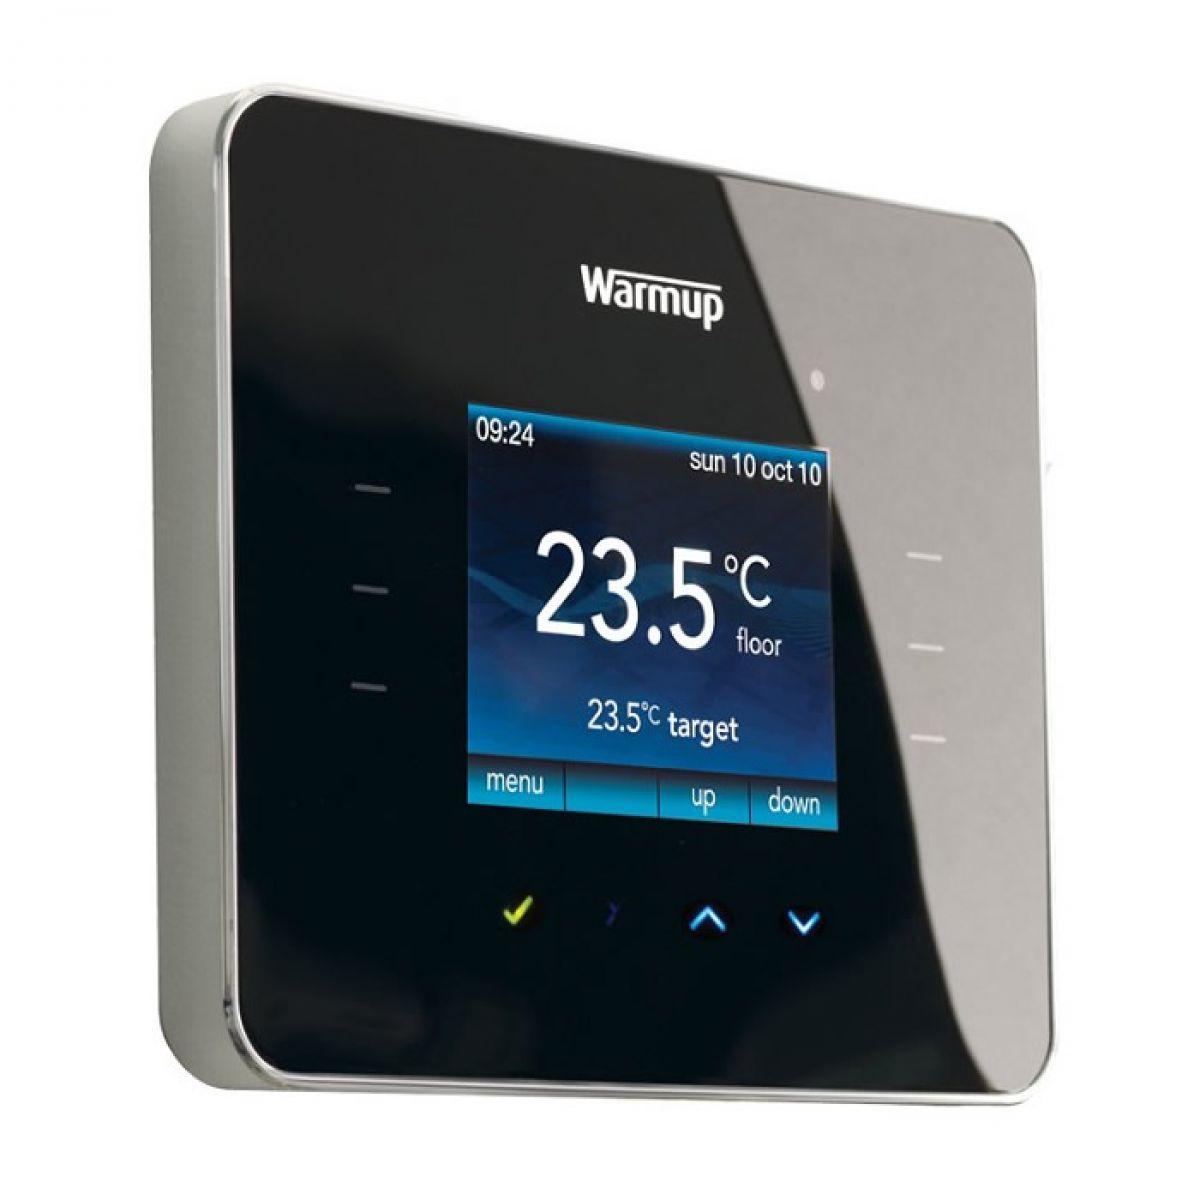 hight resolution of photos of warmup underfloor heating